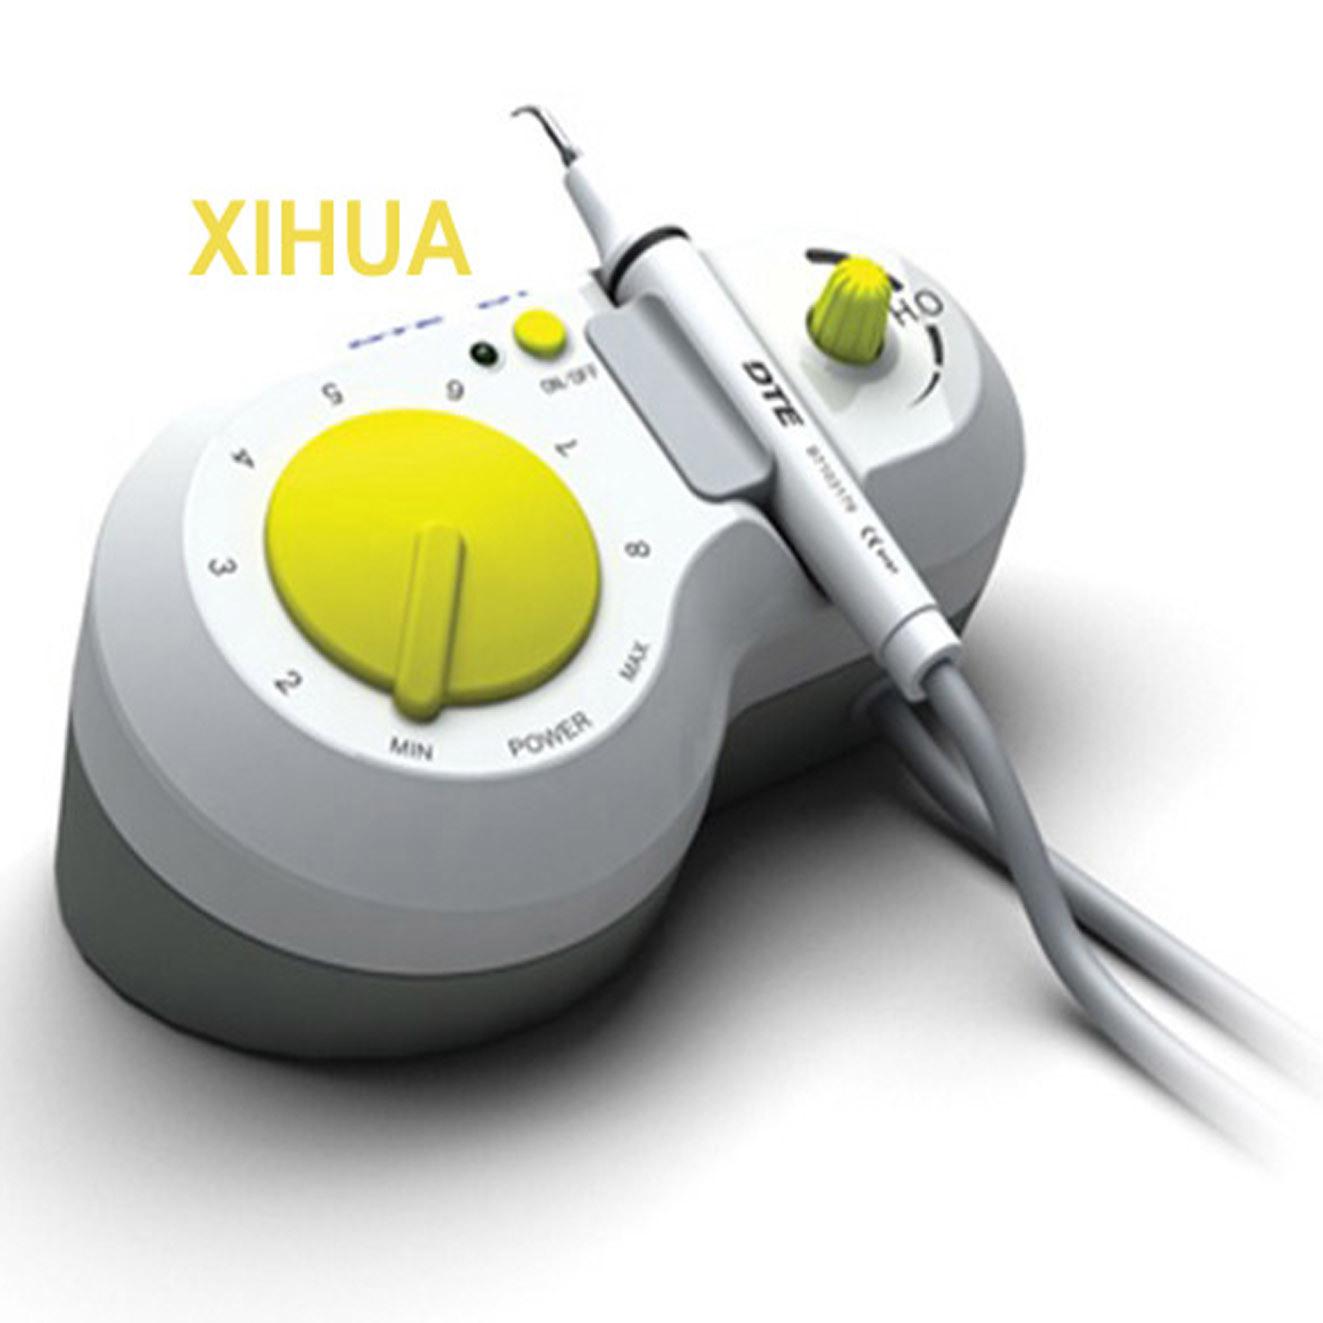 China Dte D1 Ultrasonic Scaler China Ultrasonic Scaler